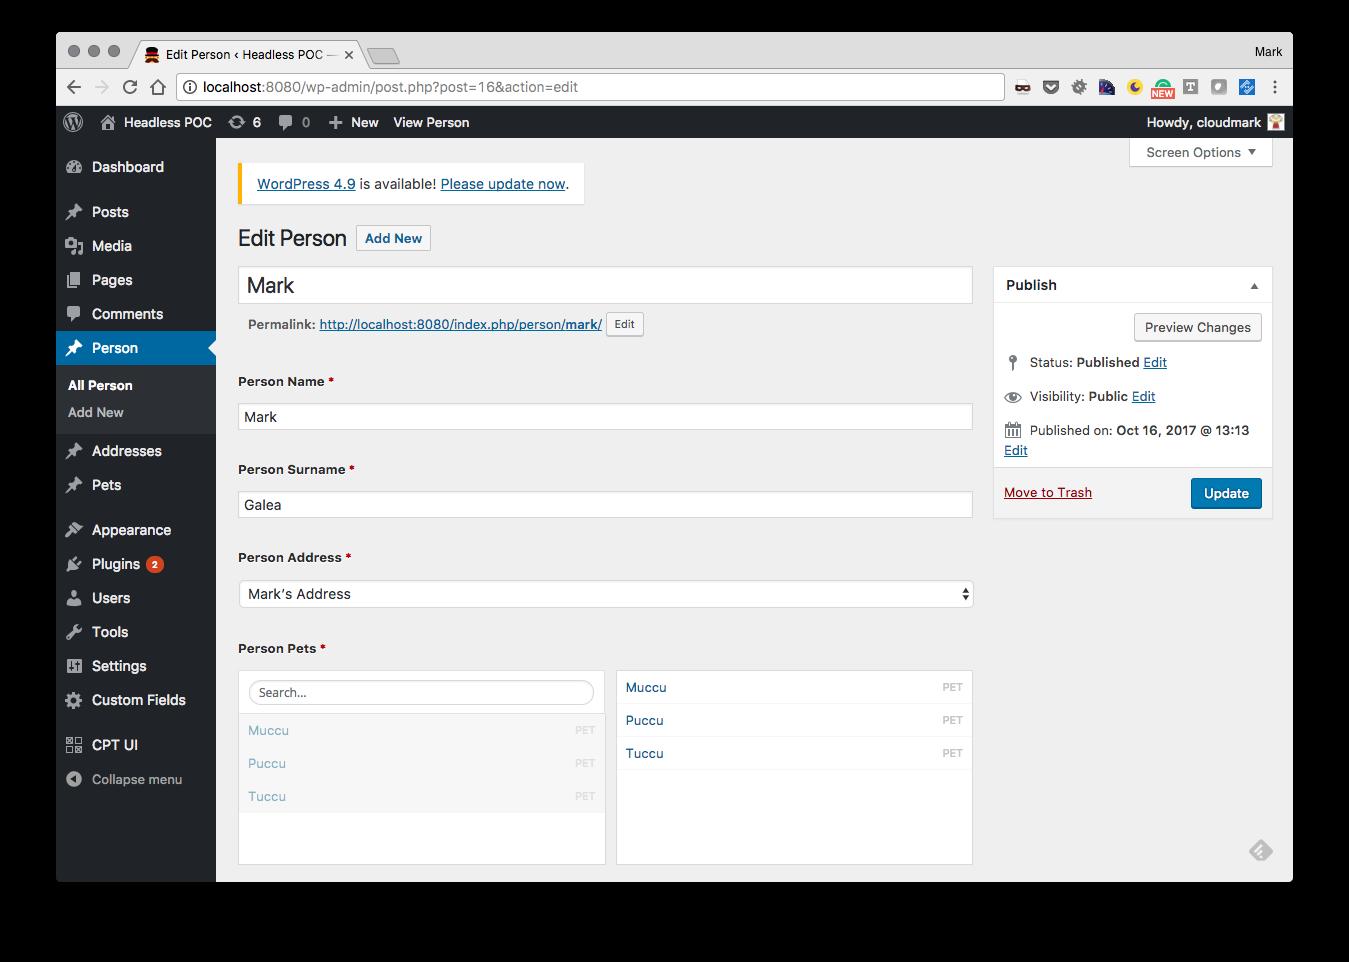 An efficient headless CMS on top of Wordpress - a k a the ACF